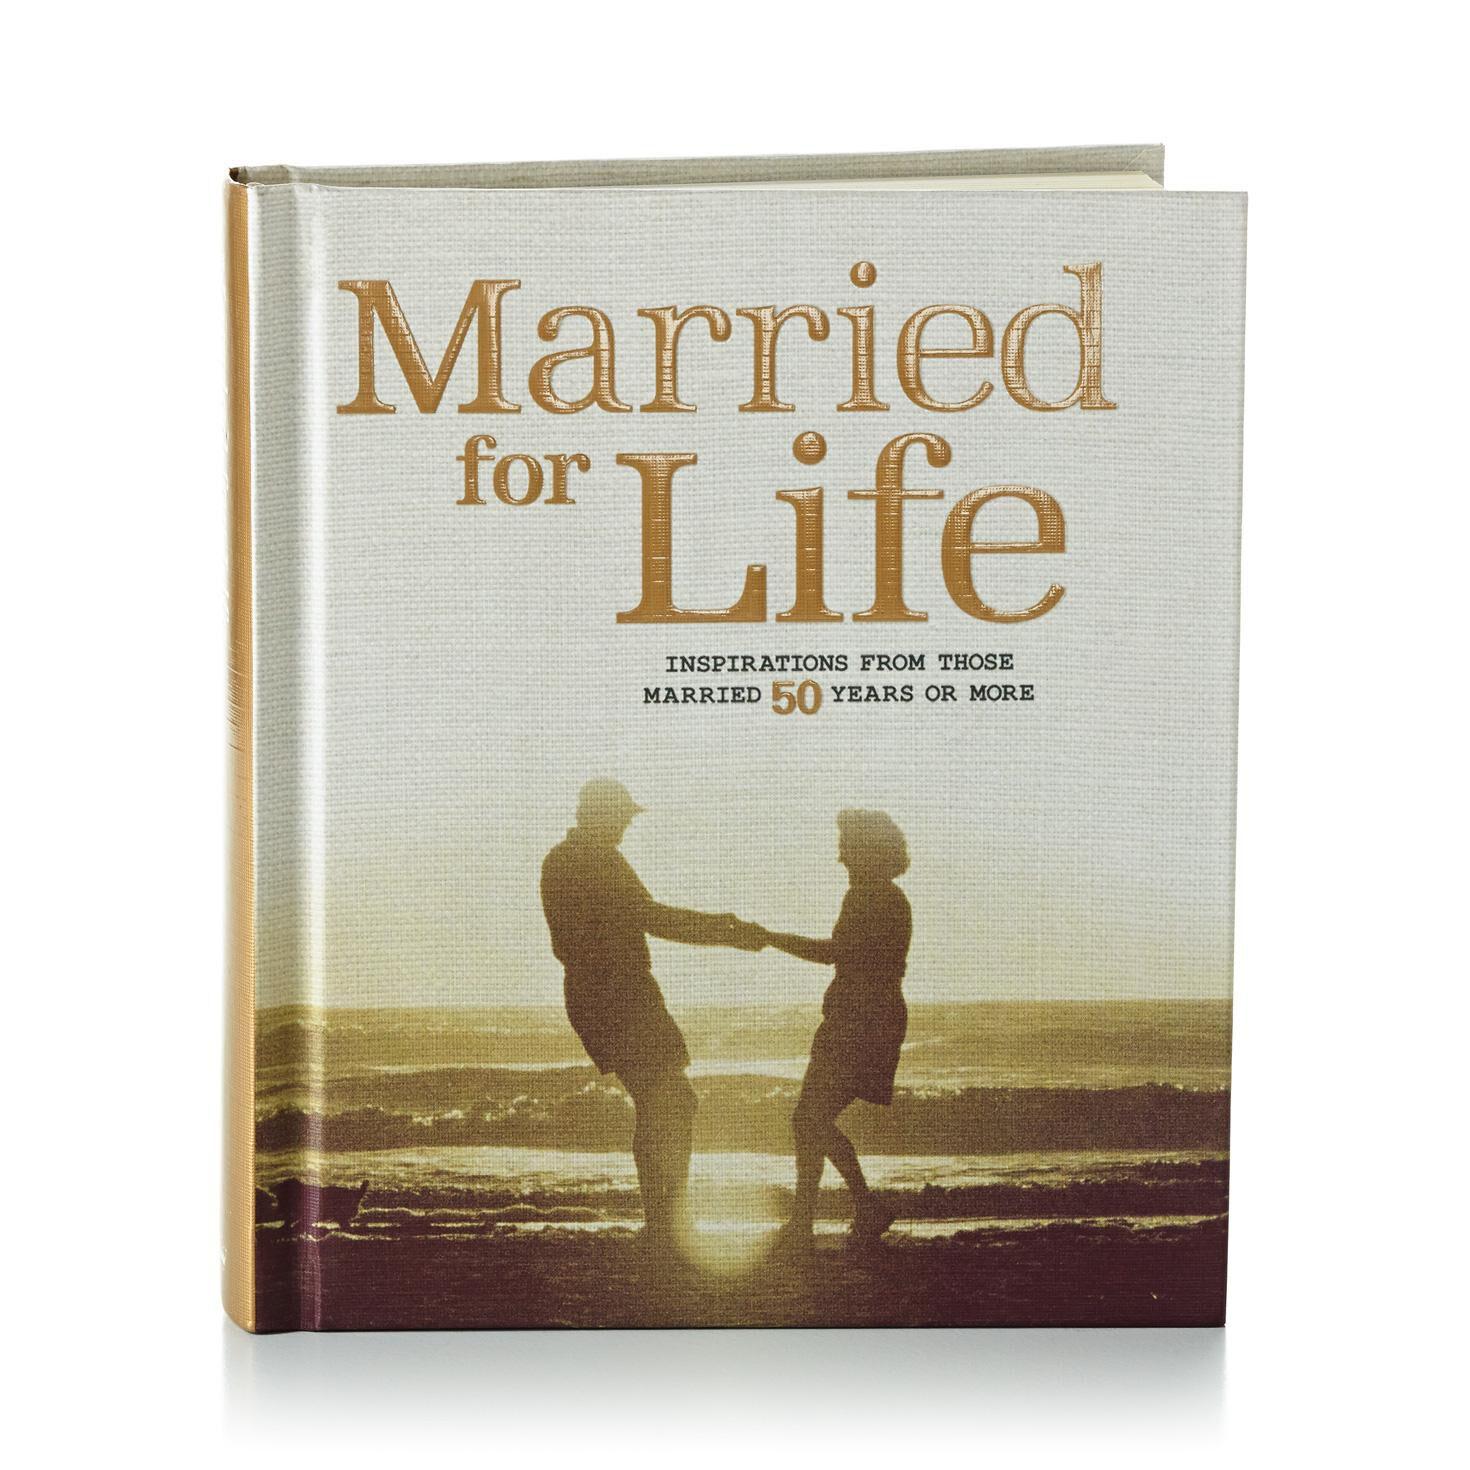 First Wedding Anniversary Celebration Ideas India - Jewelry Engagement